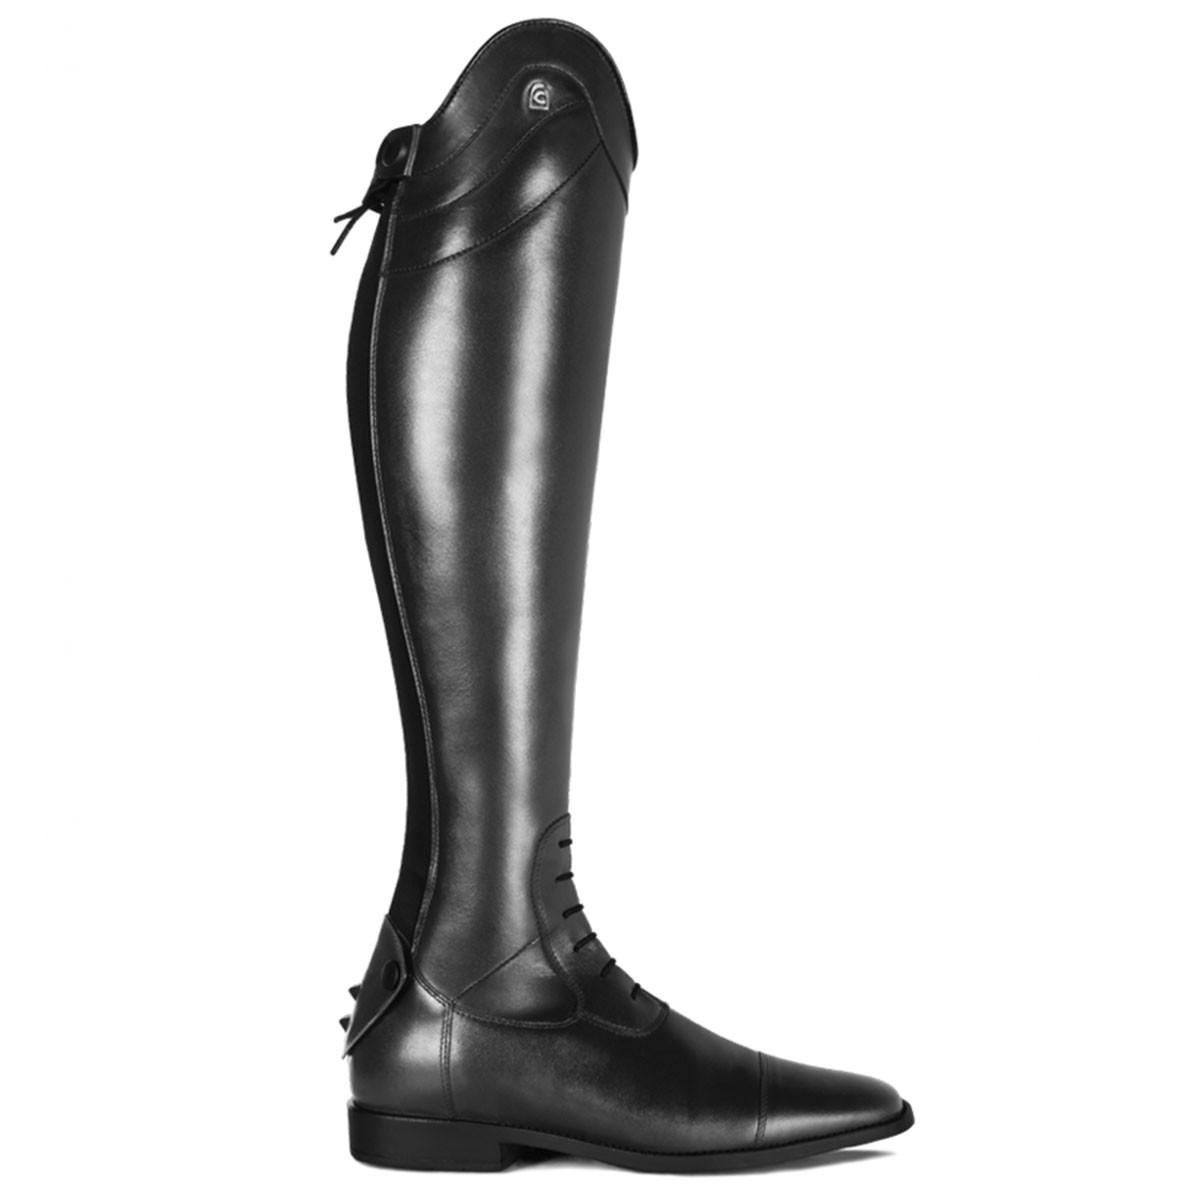 Cavallo Linus Slim rijlaars zwart maat:6-6.5 / h50-w34